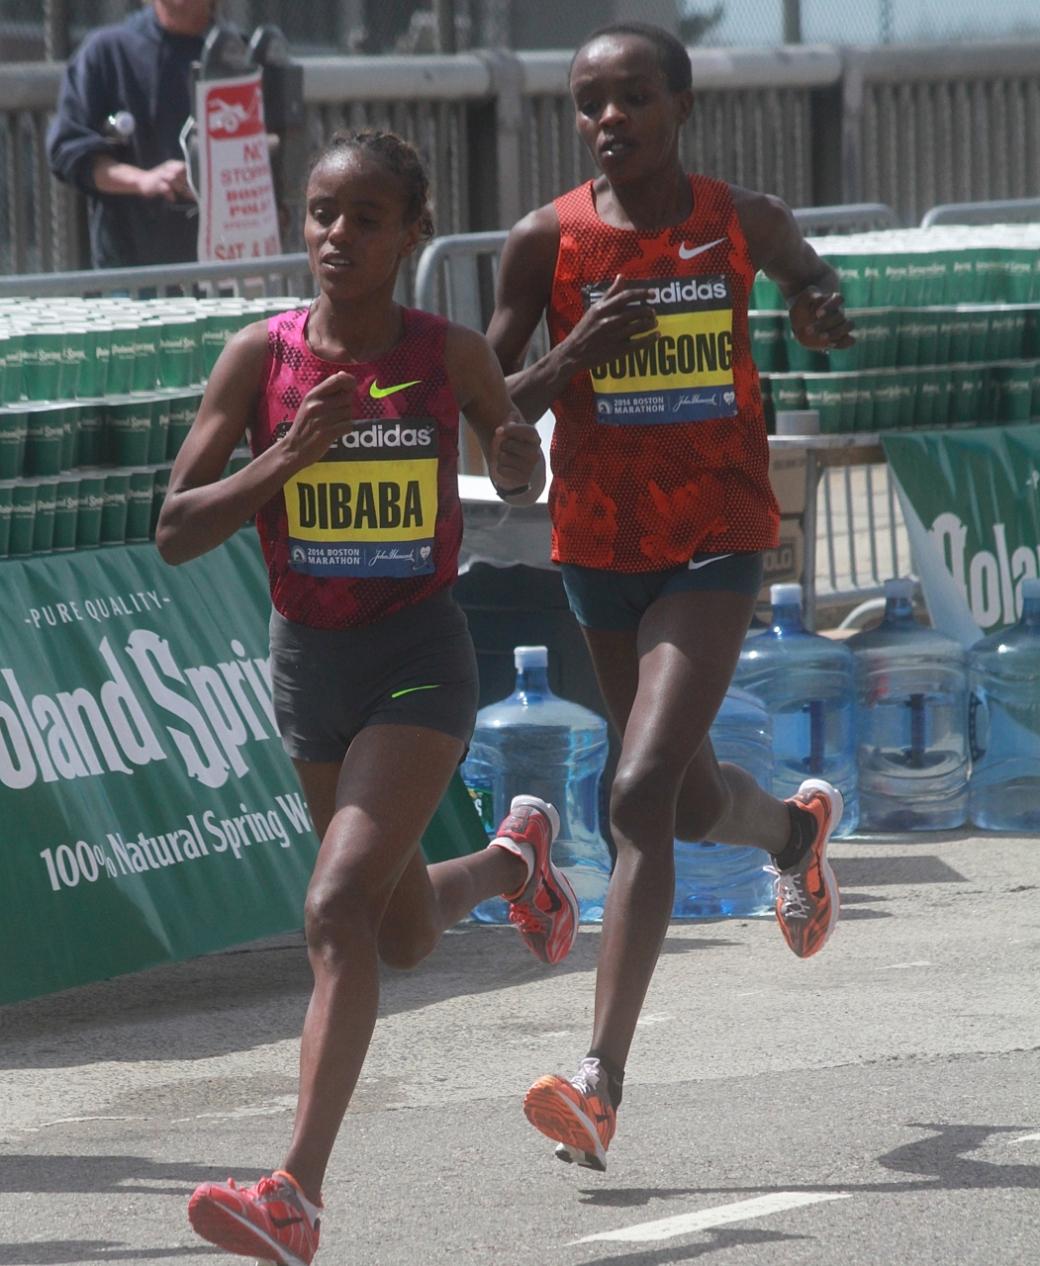 boston marathon april 21 beacon street elite runners mare dibaba runner gomgong